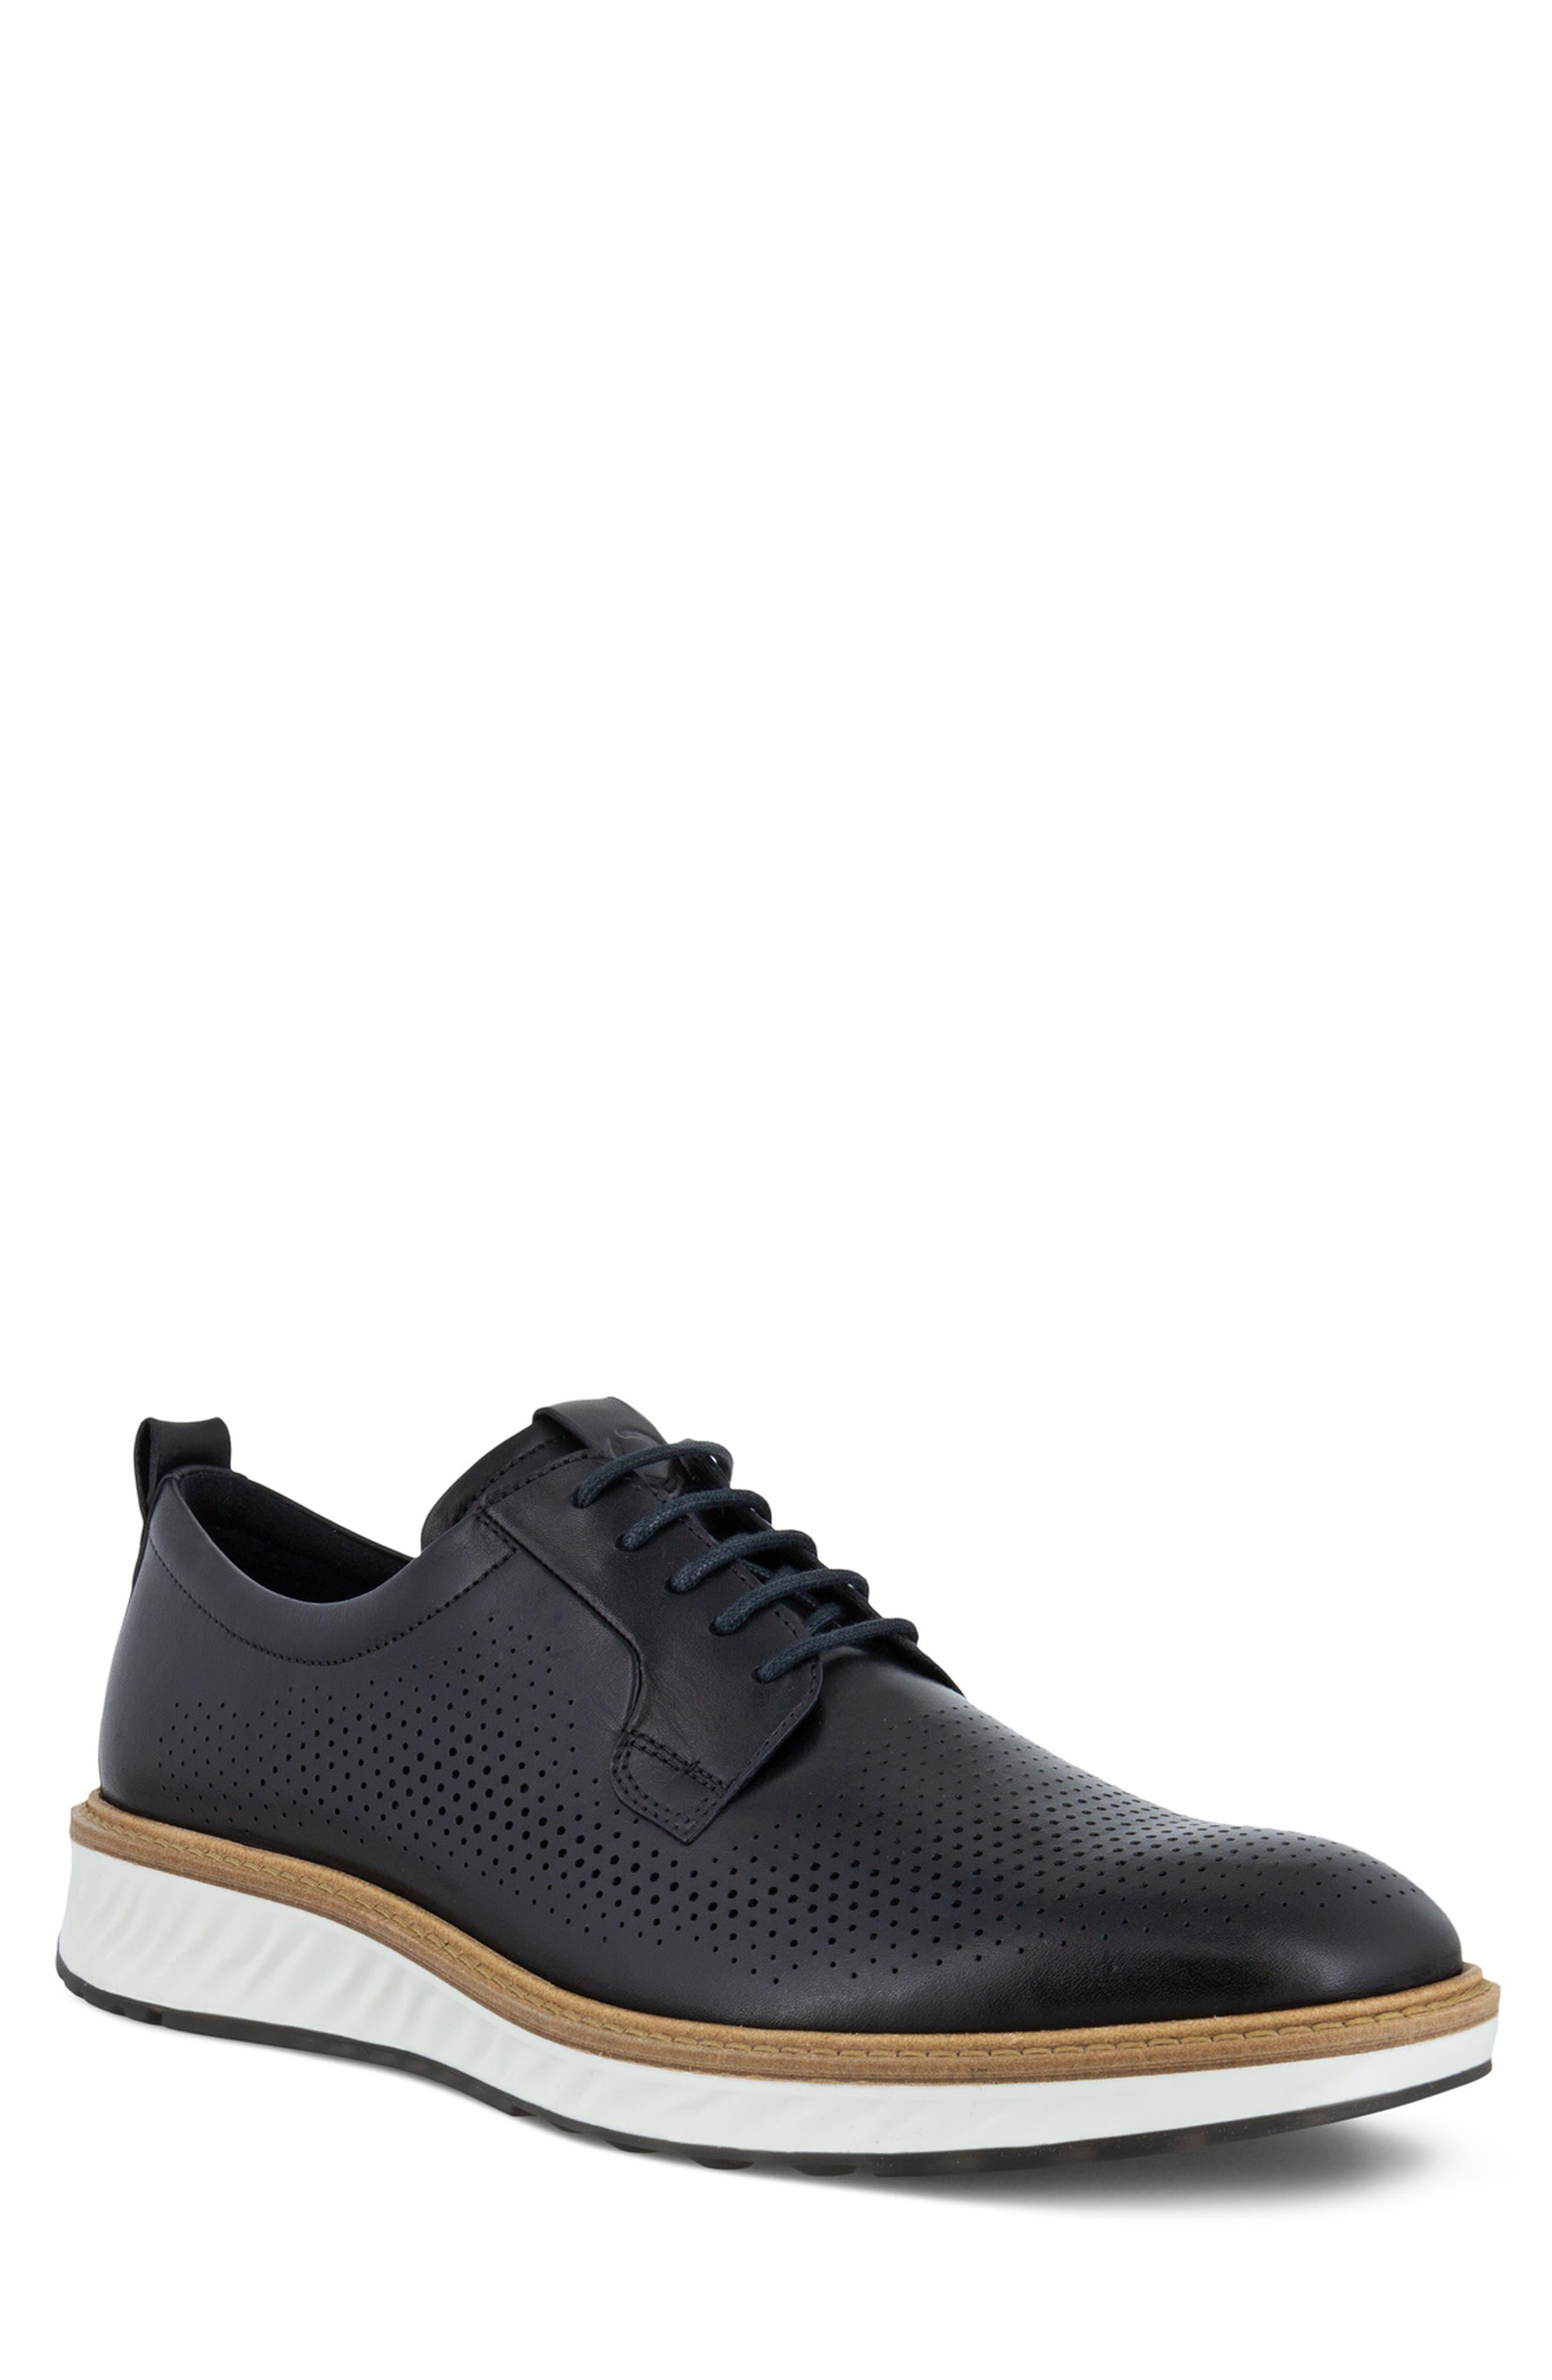 ECCO Men's Ecco St. 1 Hybrid Plain Toe Derby, Size 8-8.5US - Black